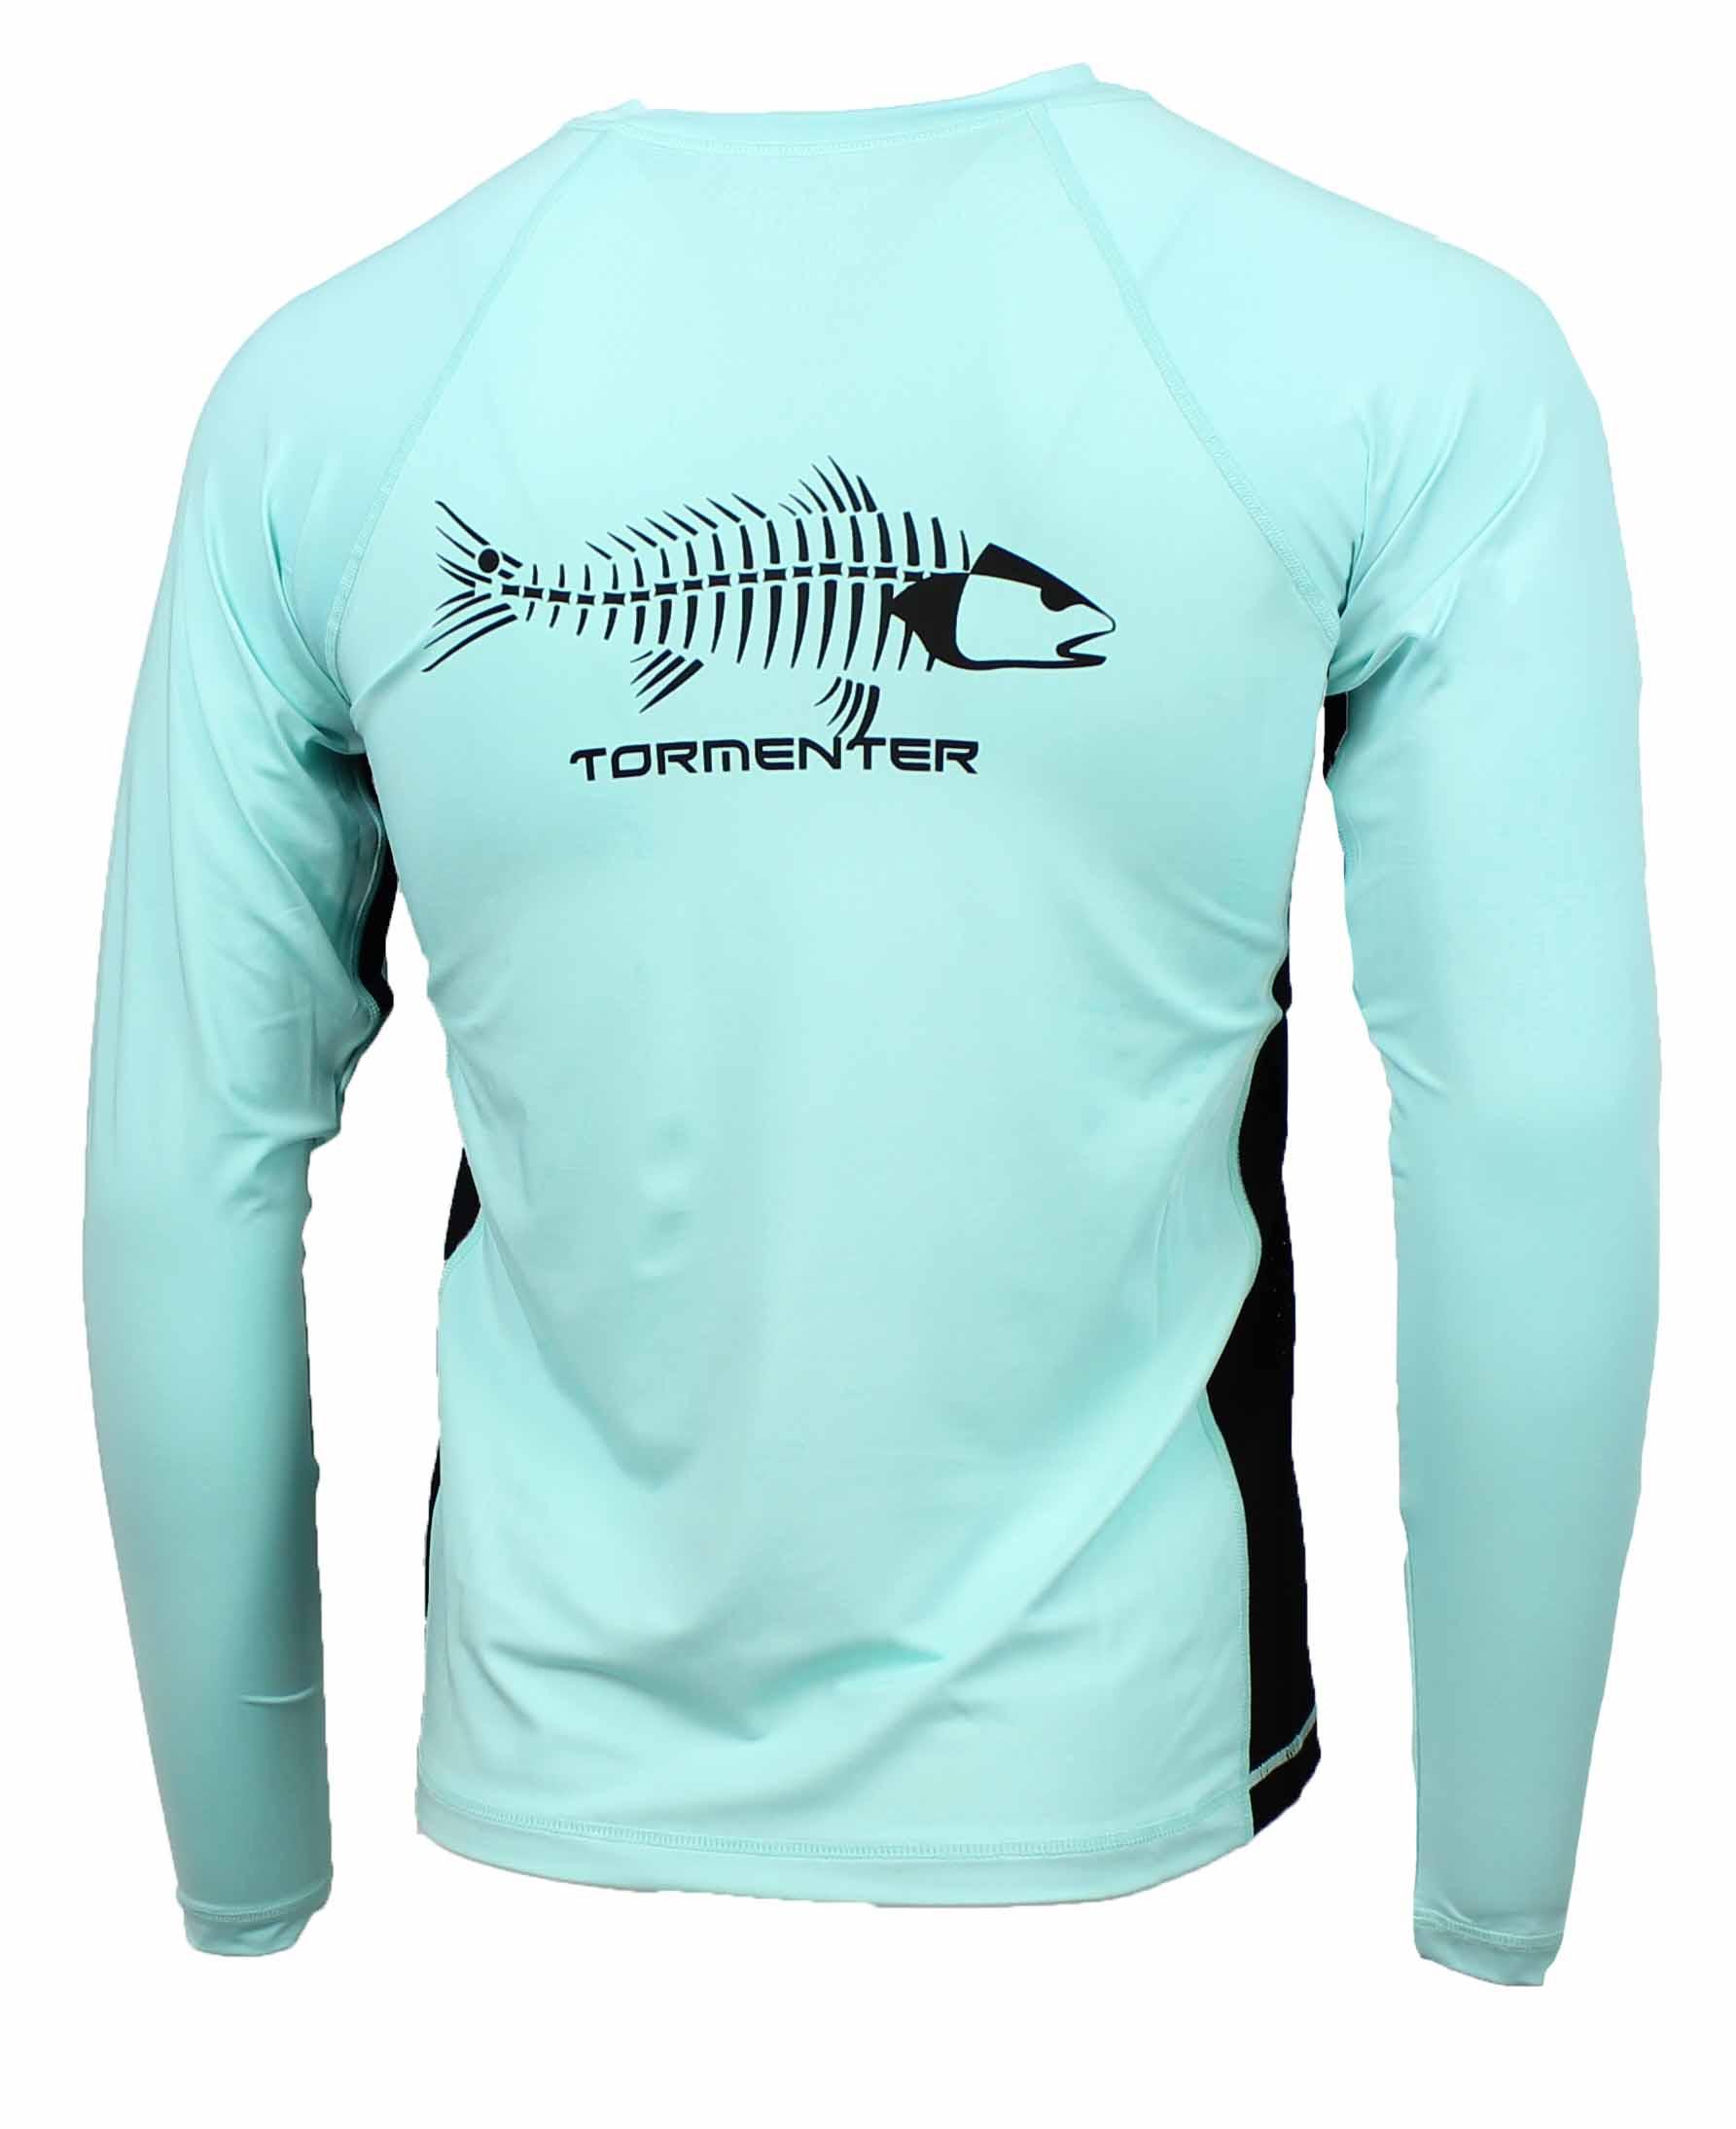 Tormenter men 39 s spf 50 long sleeve fishing shirt ebay for 4xl fishing shirts